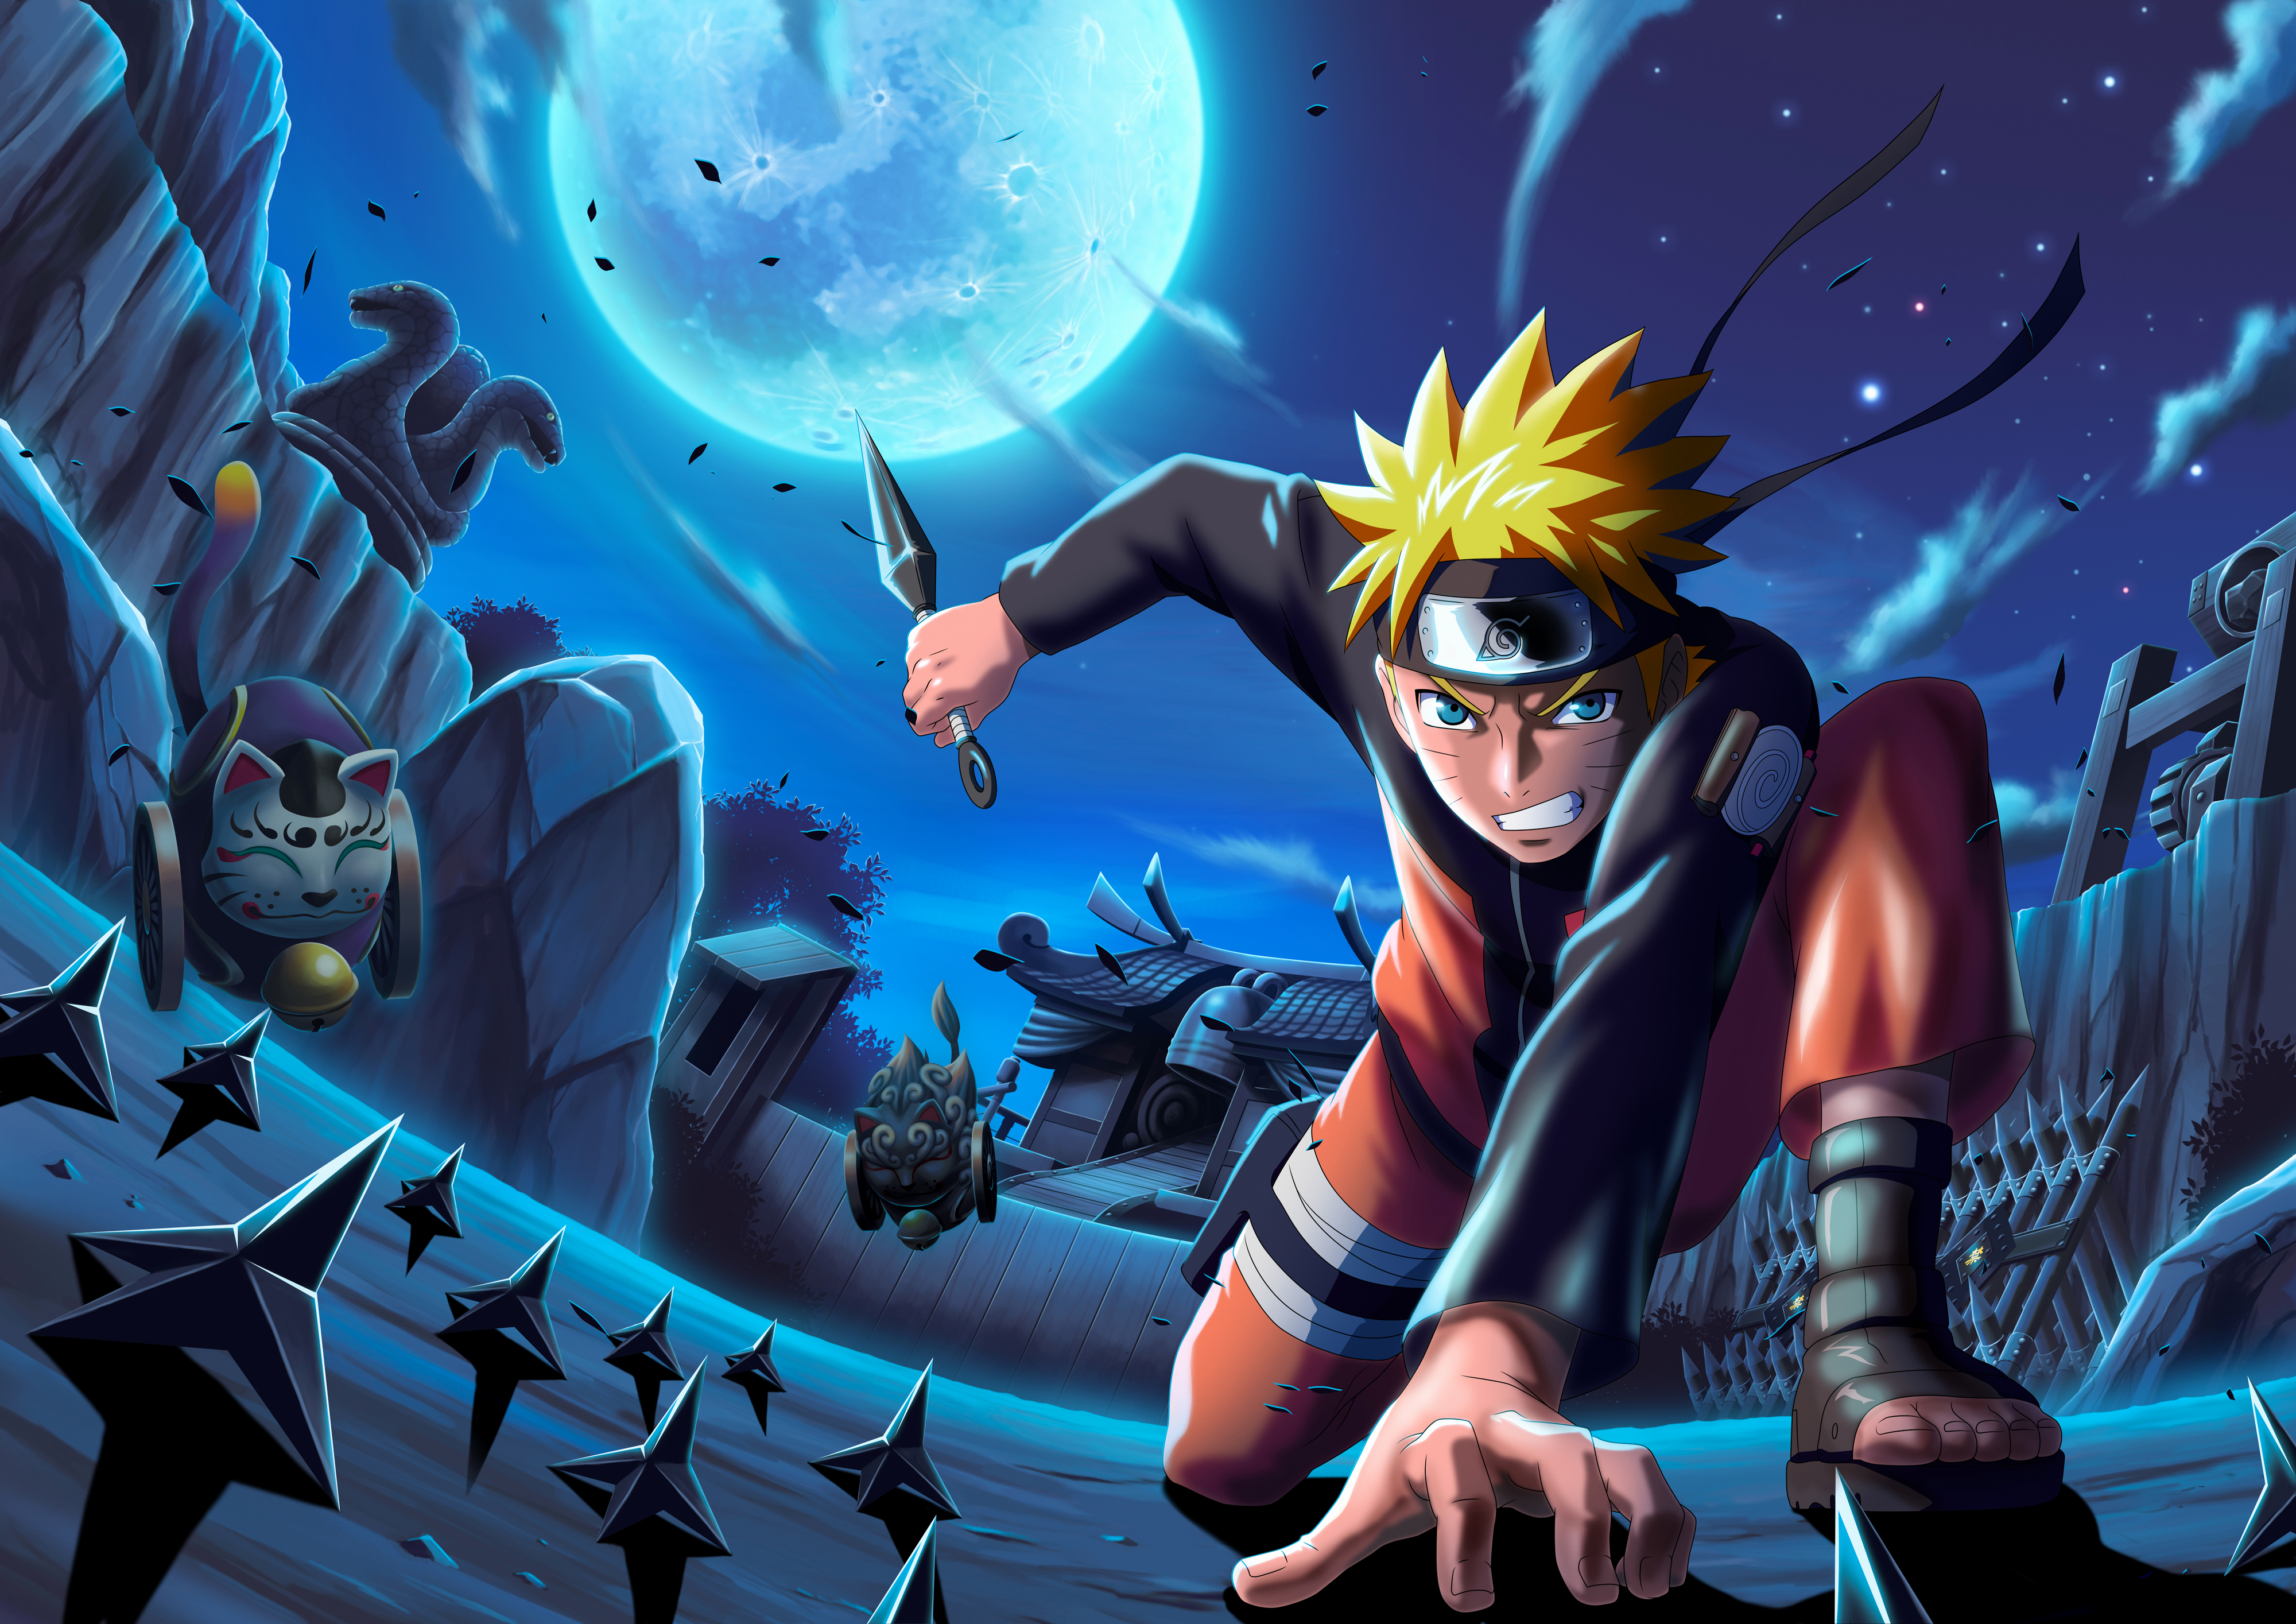 Naruto Uzumaki 4k Ultra Hd Wallpaper Background Image